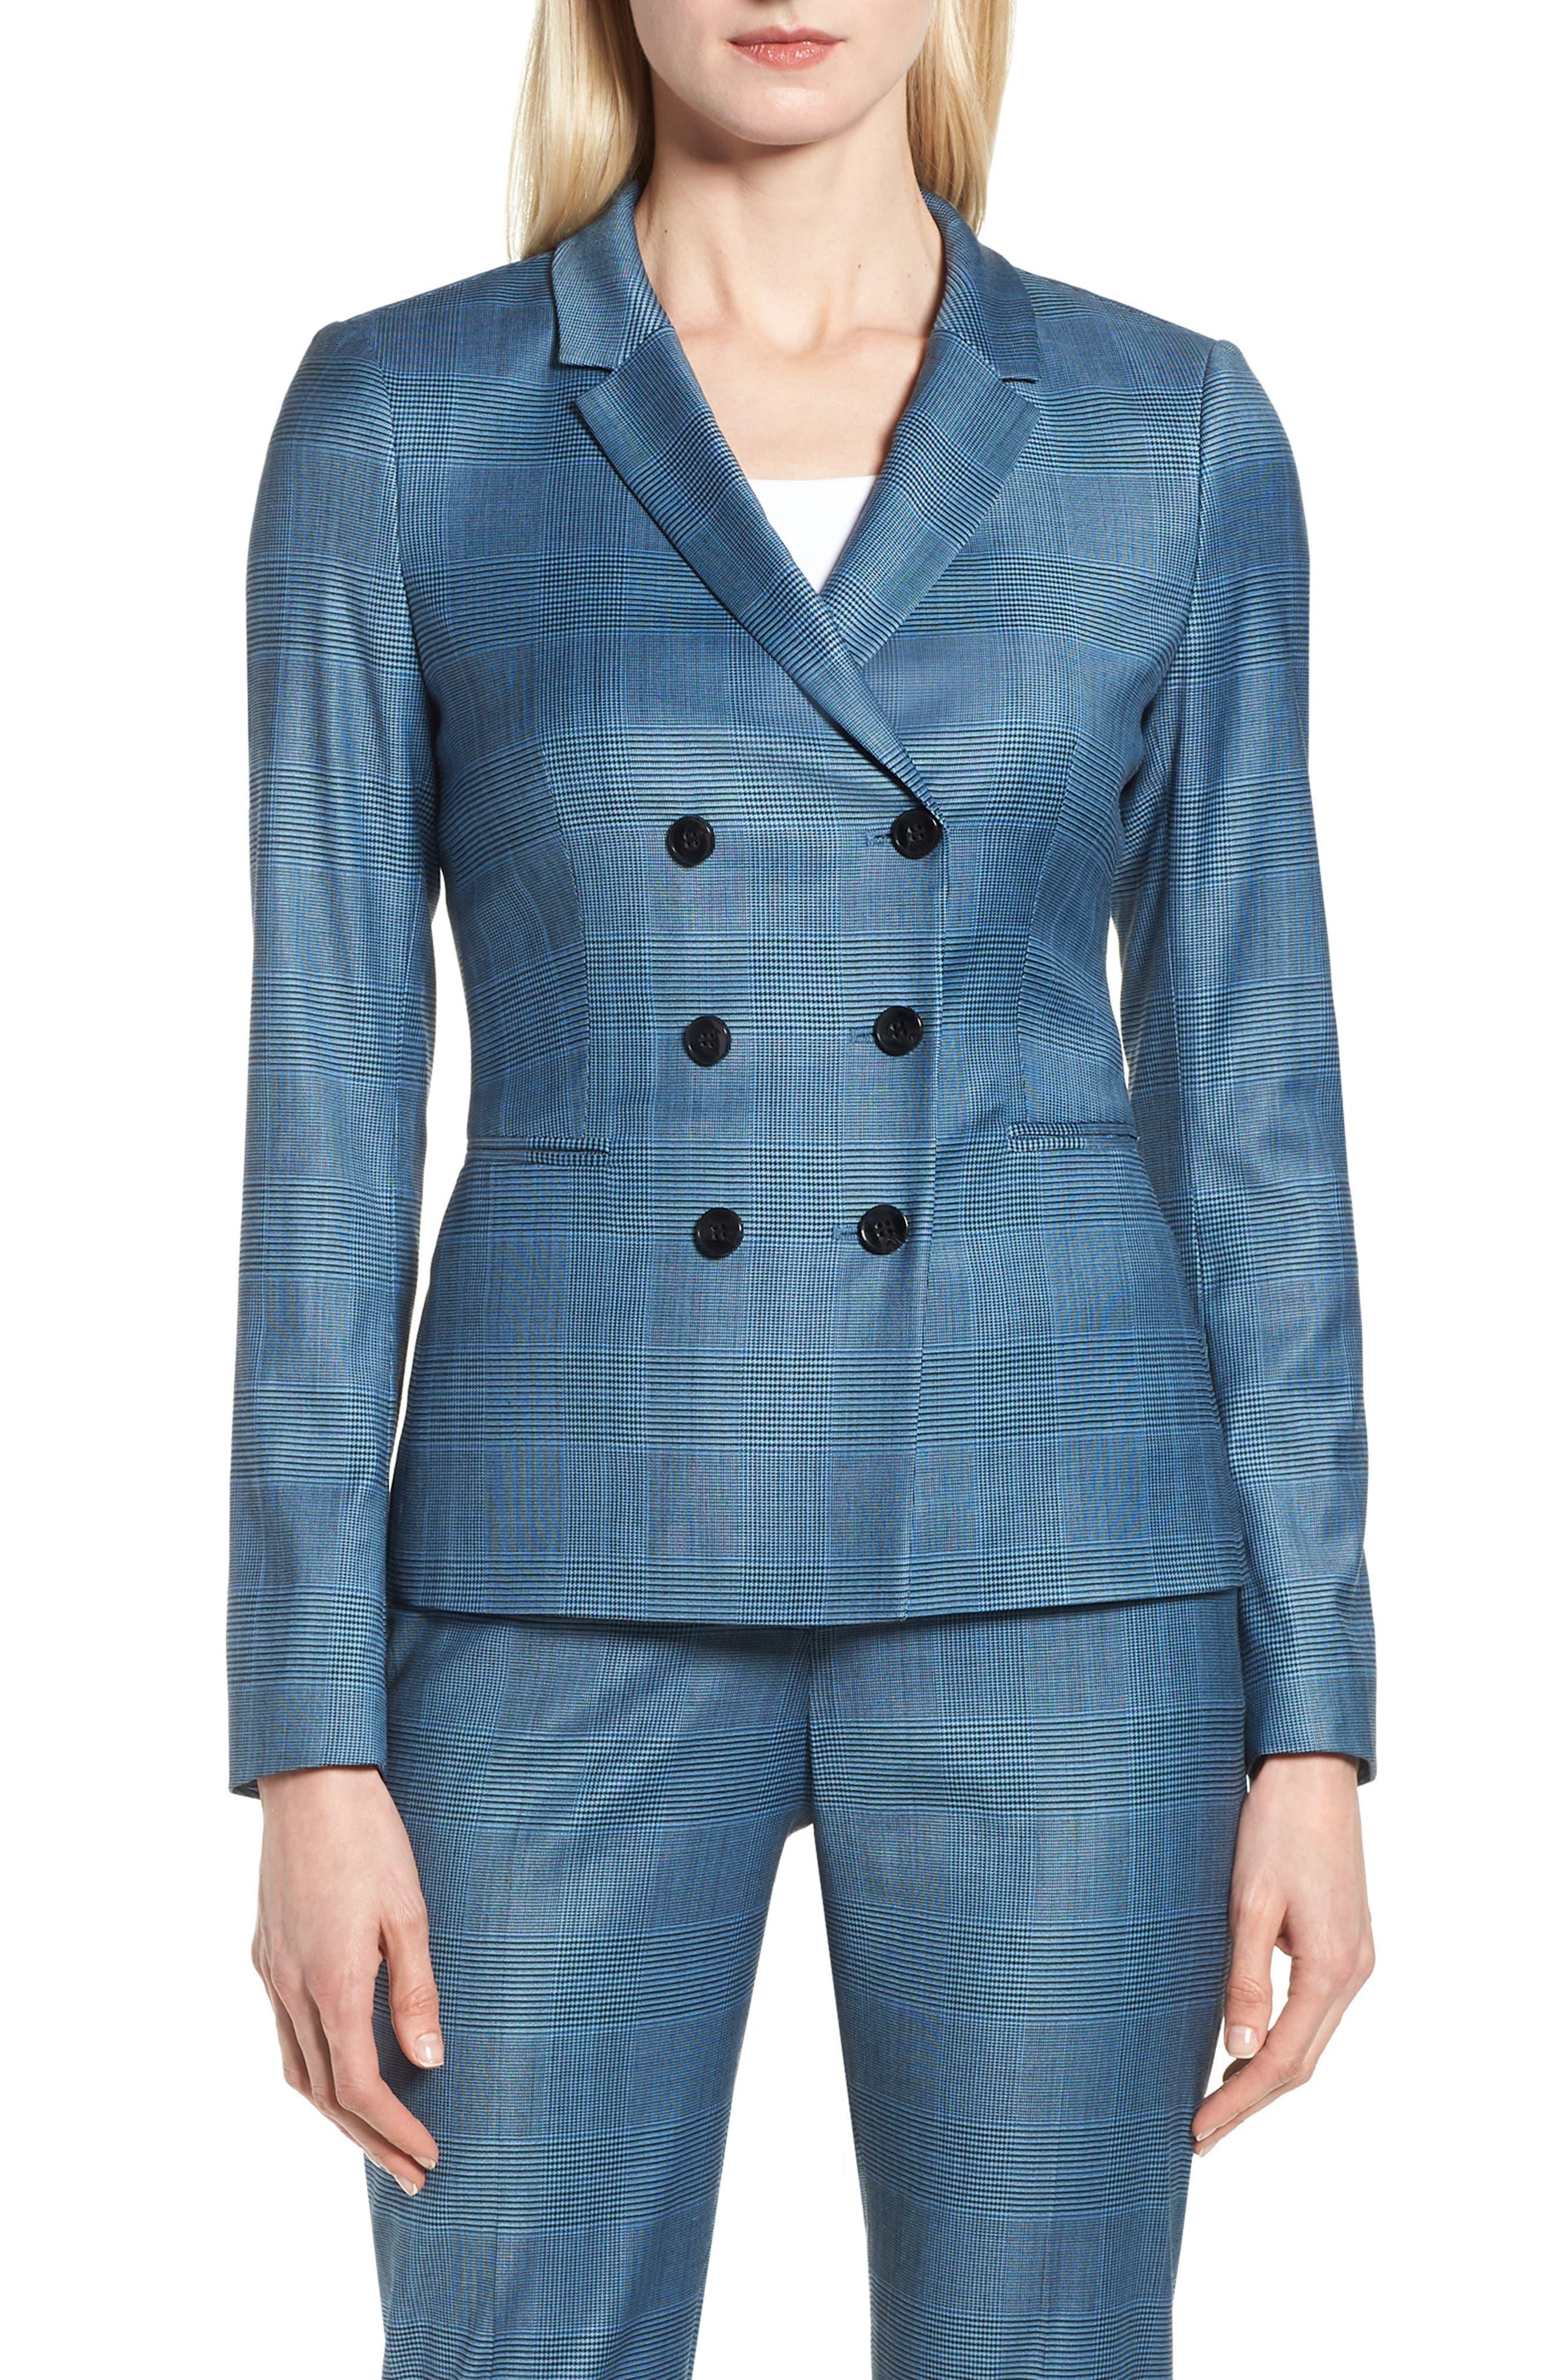 Jelaya Glencheck Double Breasted Suit Jacket,                         Main,                         color, Sailor Blue Fantasy